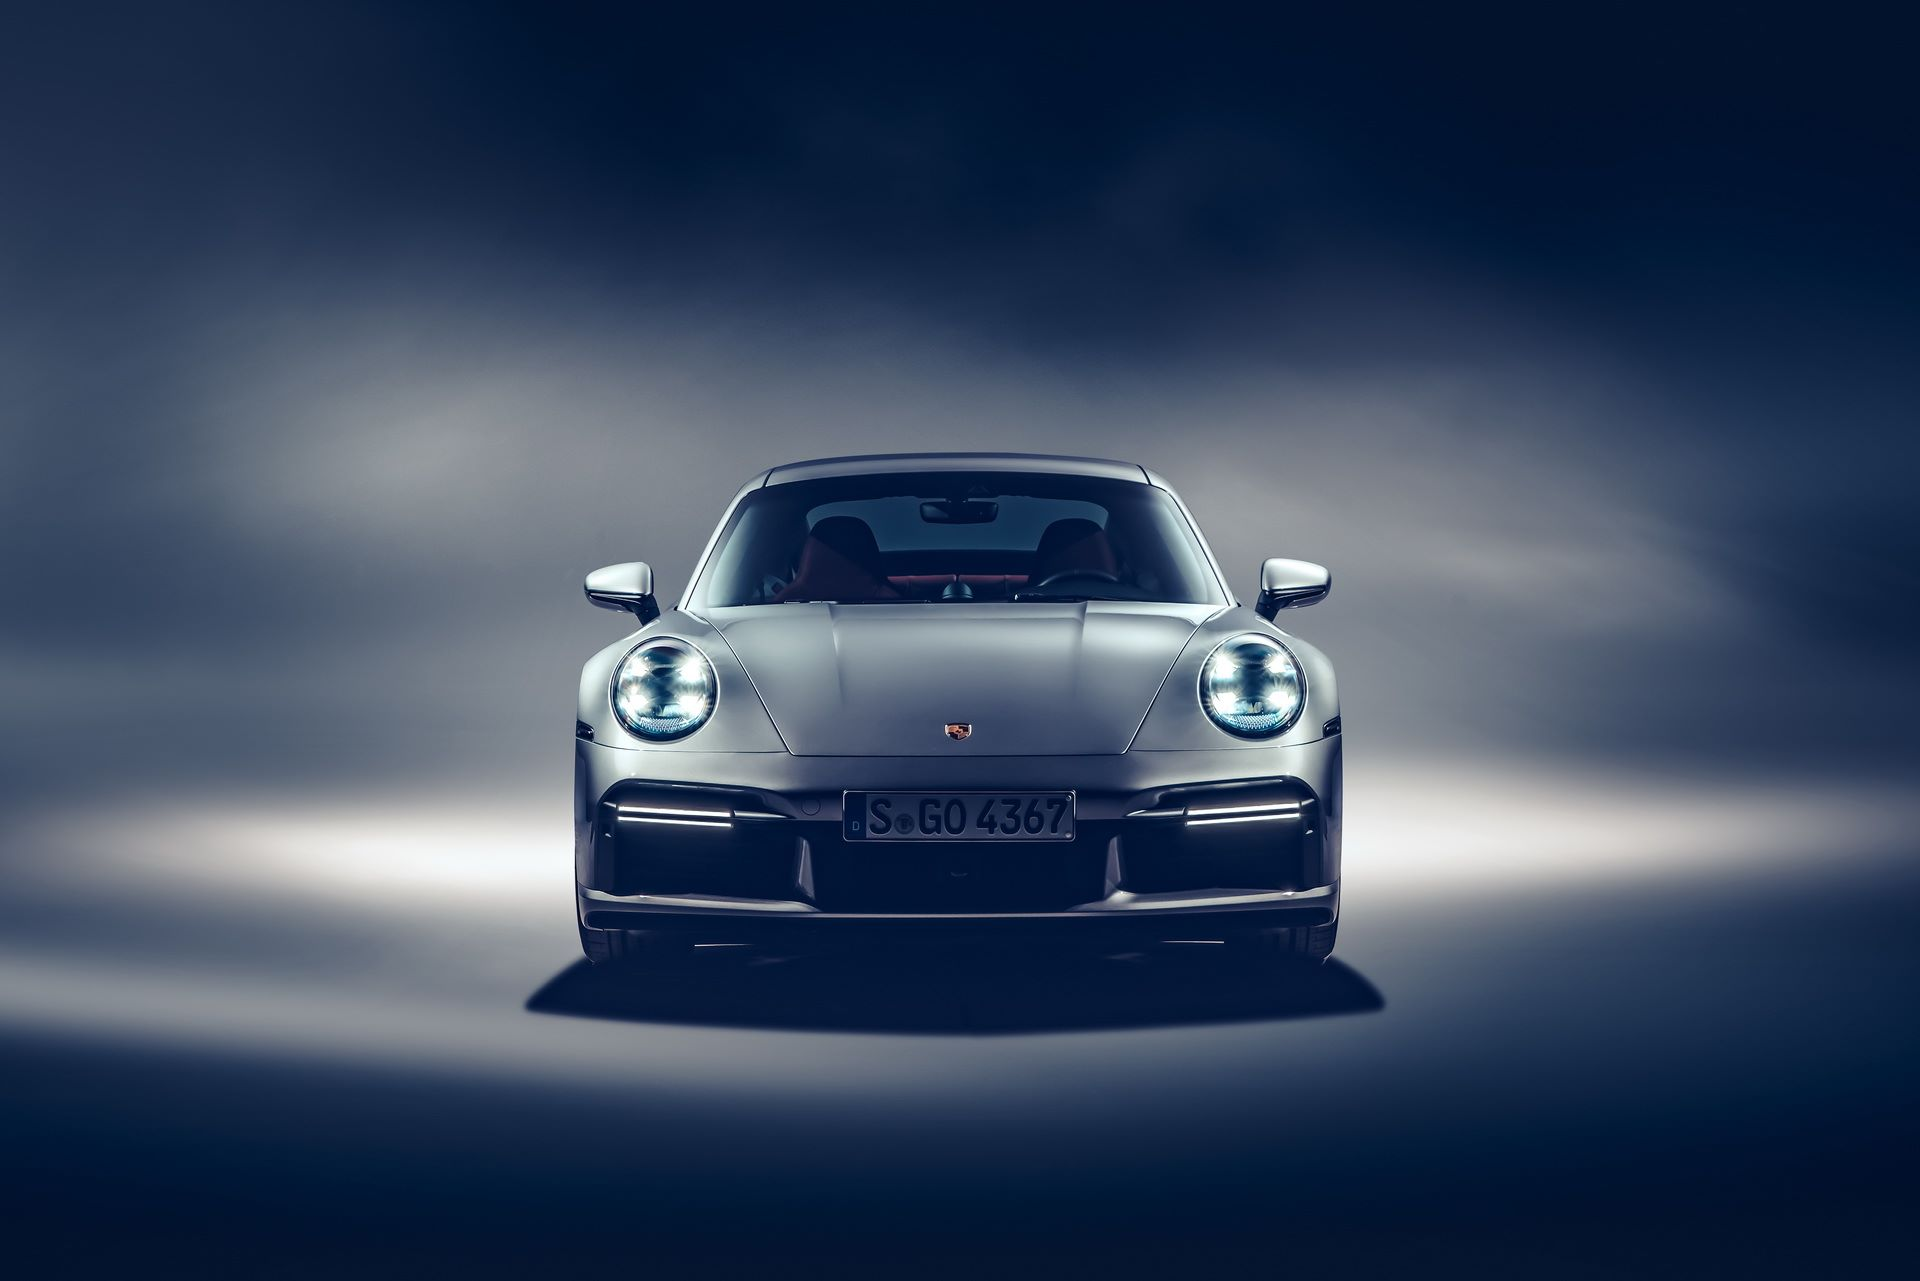 Porsche-911-Turbo-S-2020-11